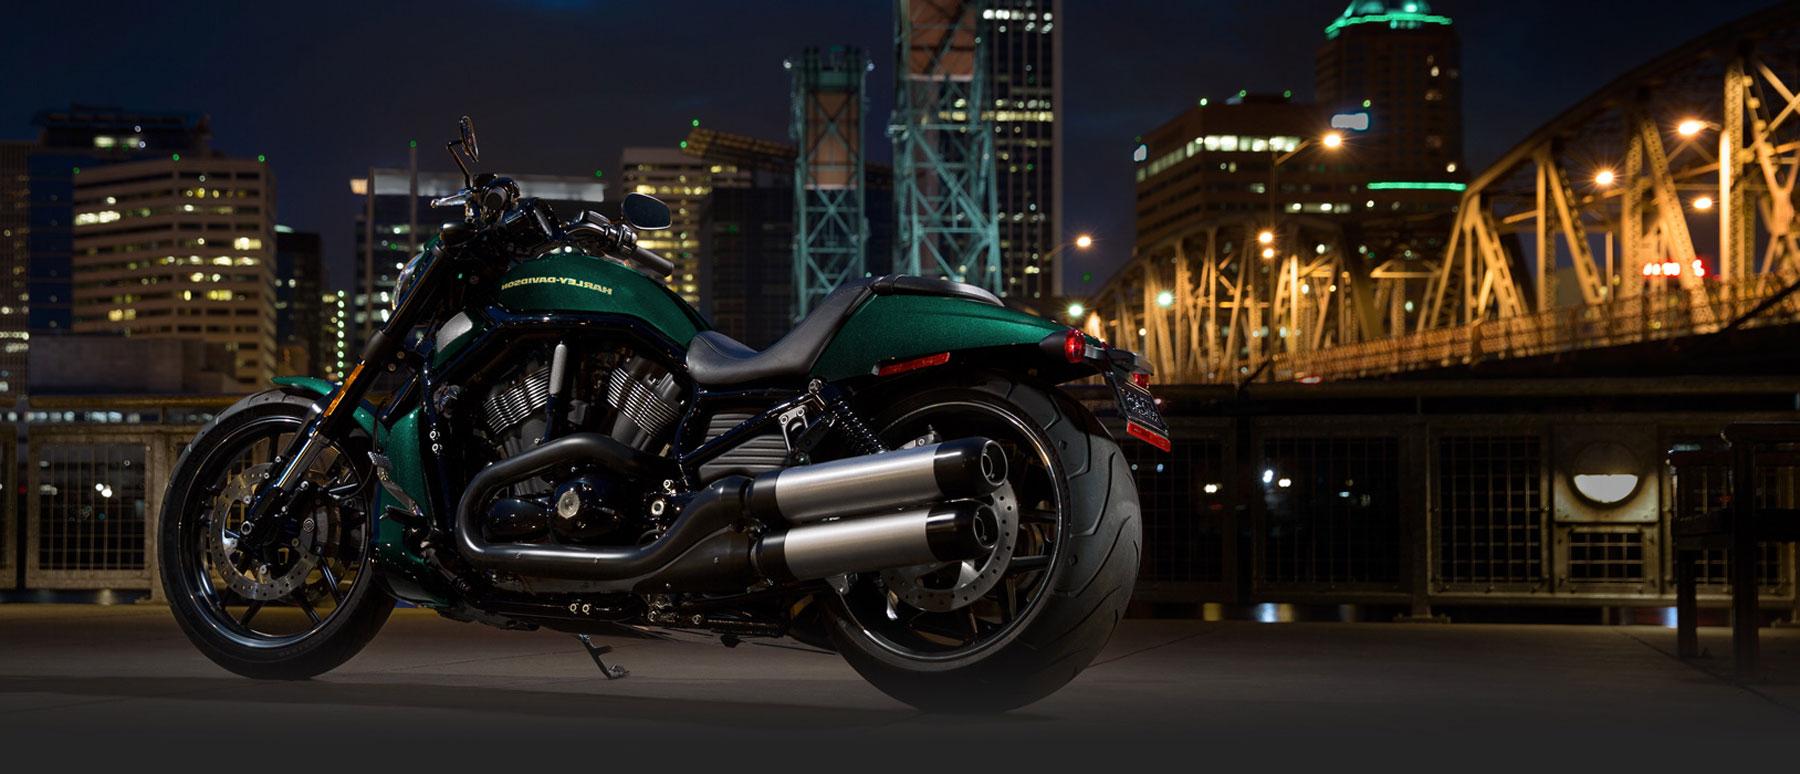 V Rod Riverside Harley Davidson